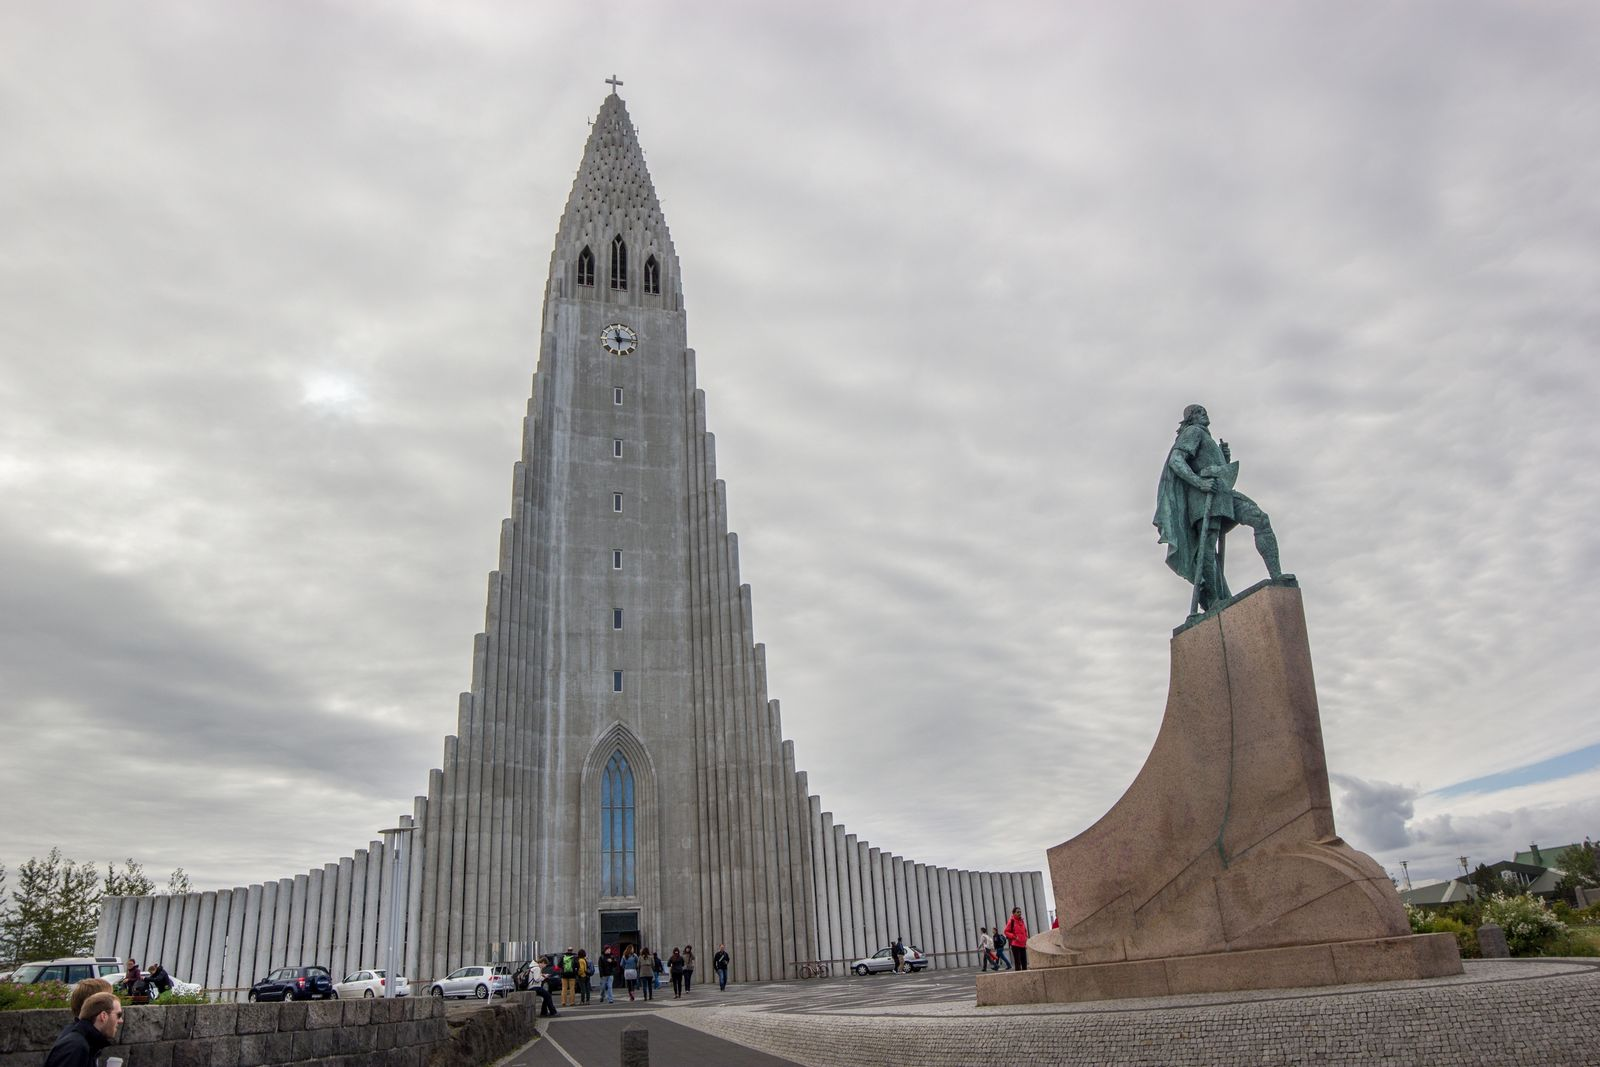 Primerísima parada: la iglesia de Hallgrímskirkja